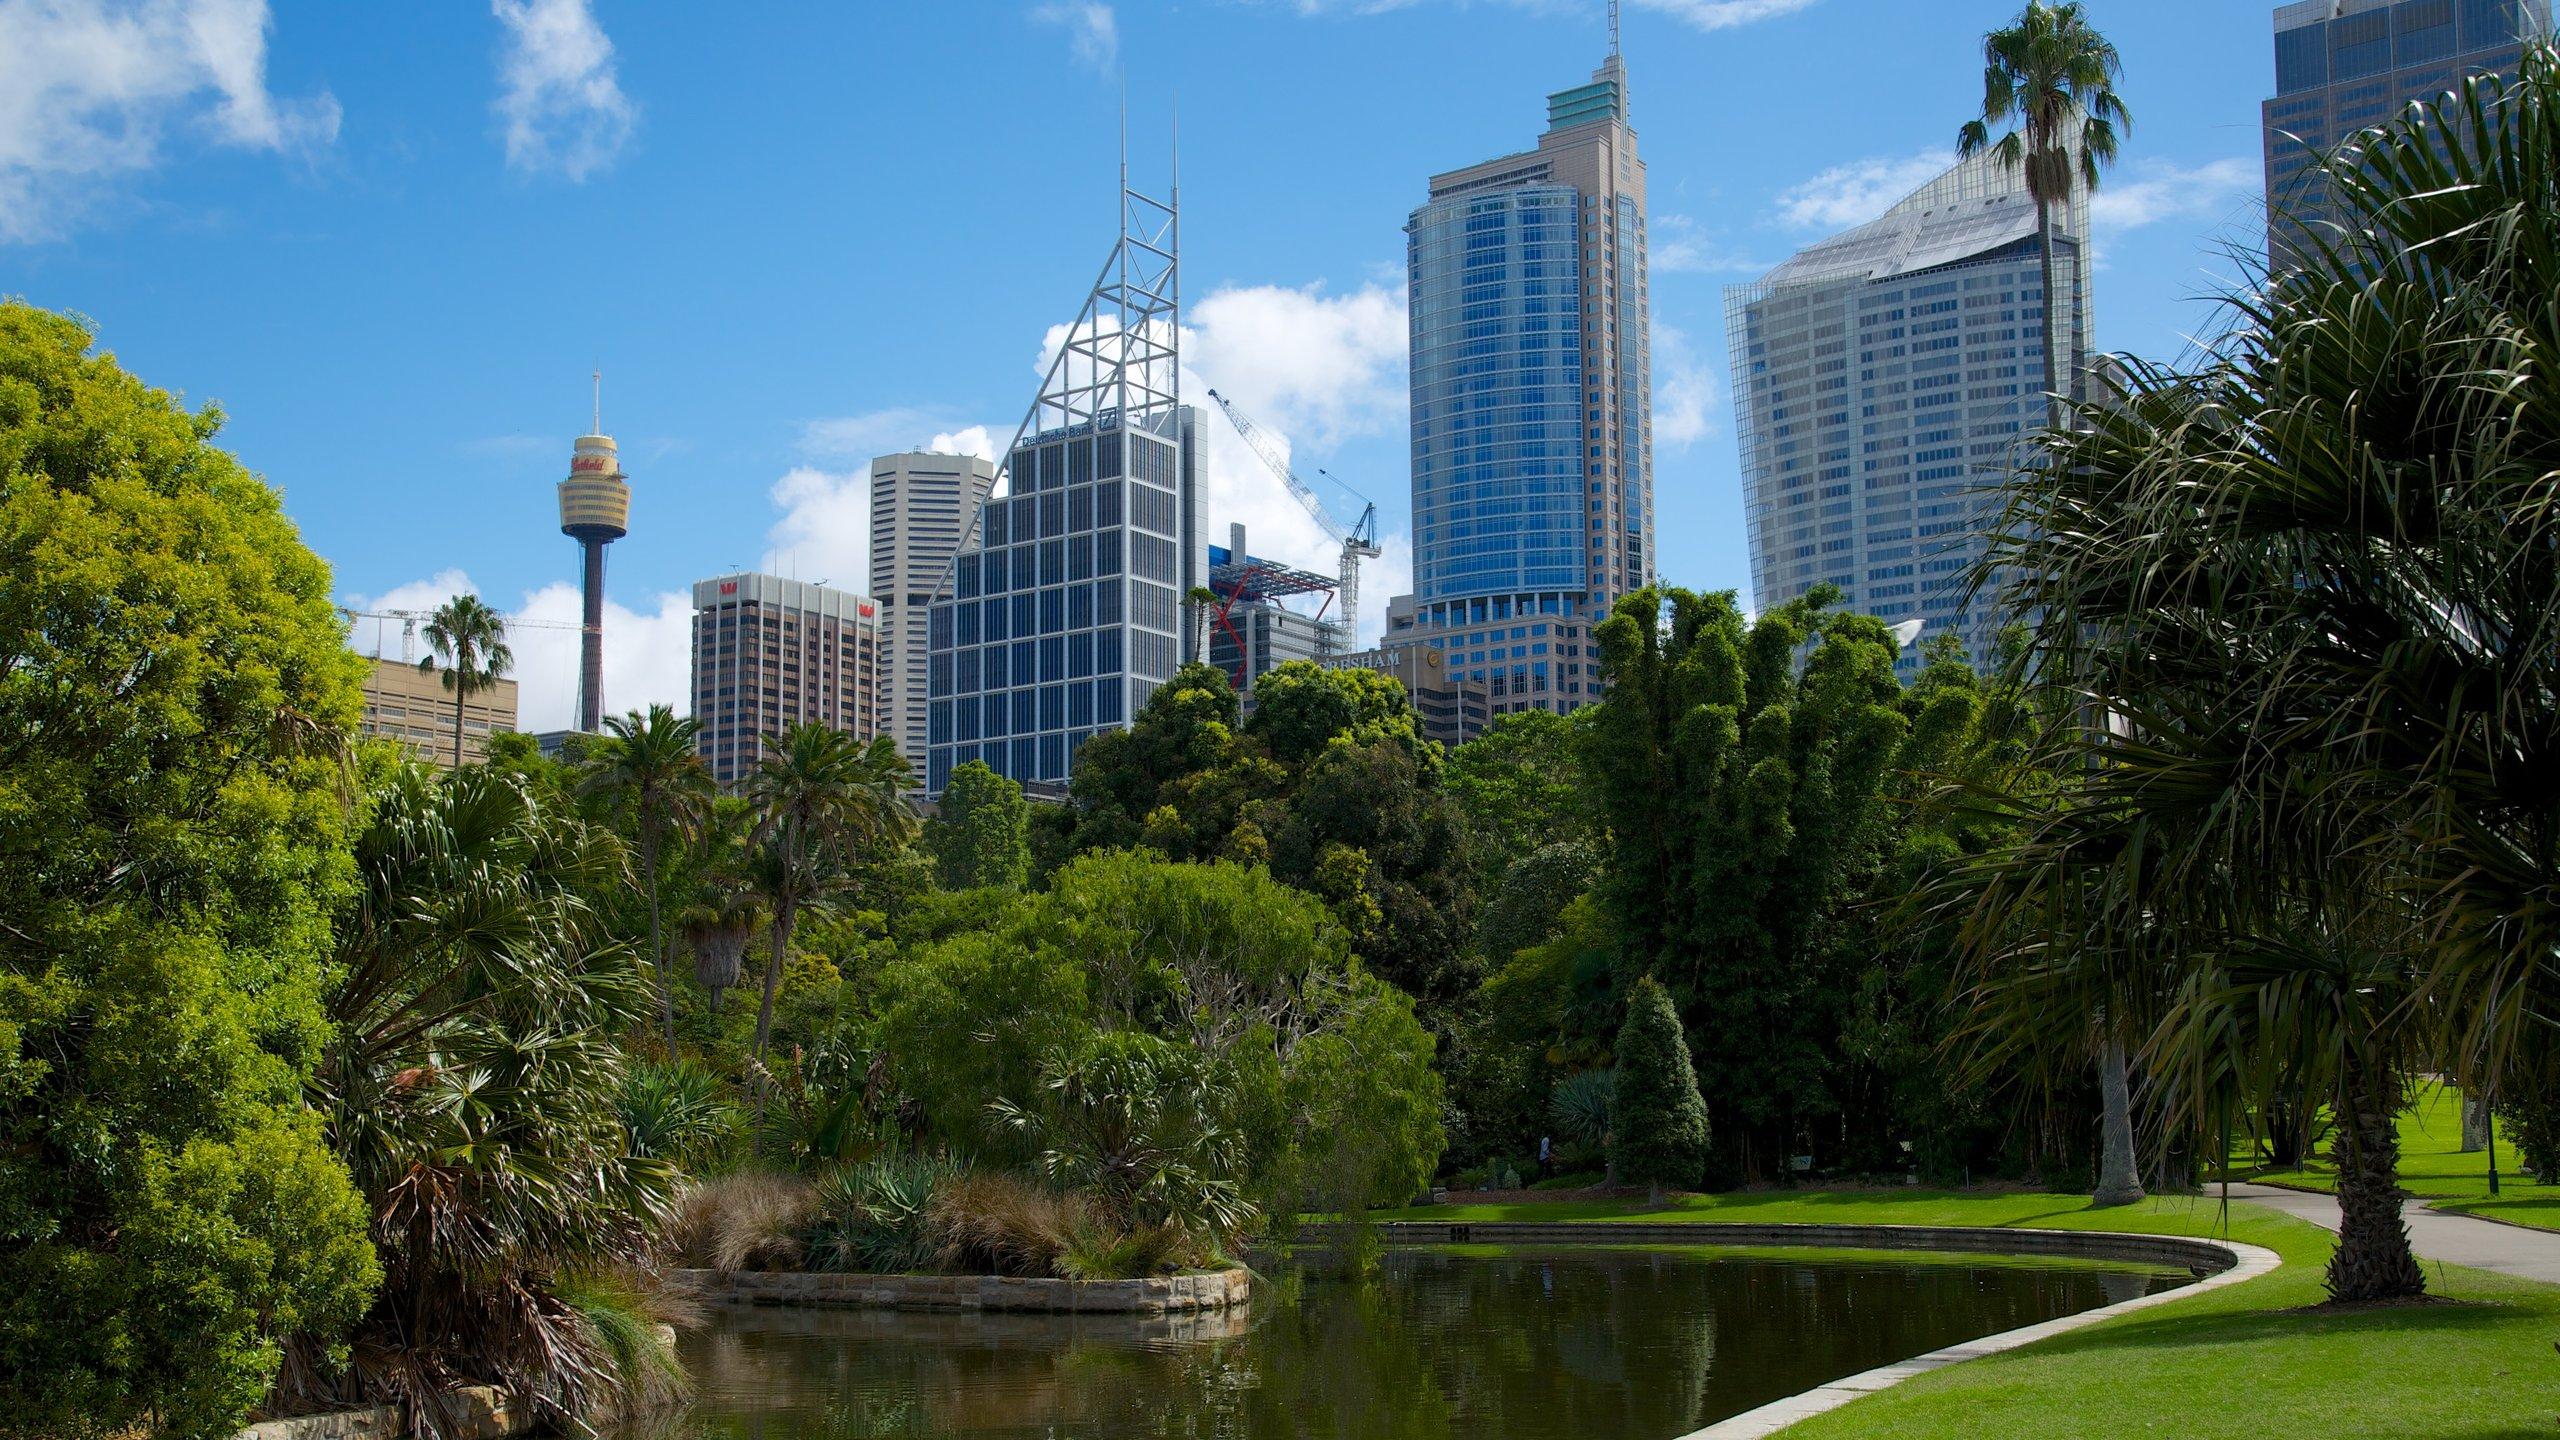 31593 Royal Botanic Gardens - Closest Train Station To Royal Botanic Gardens Sydney